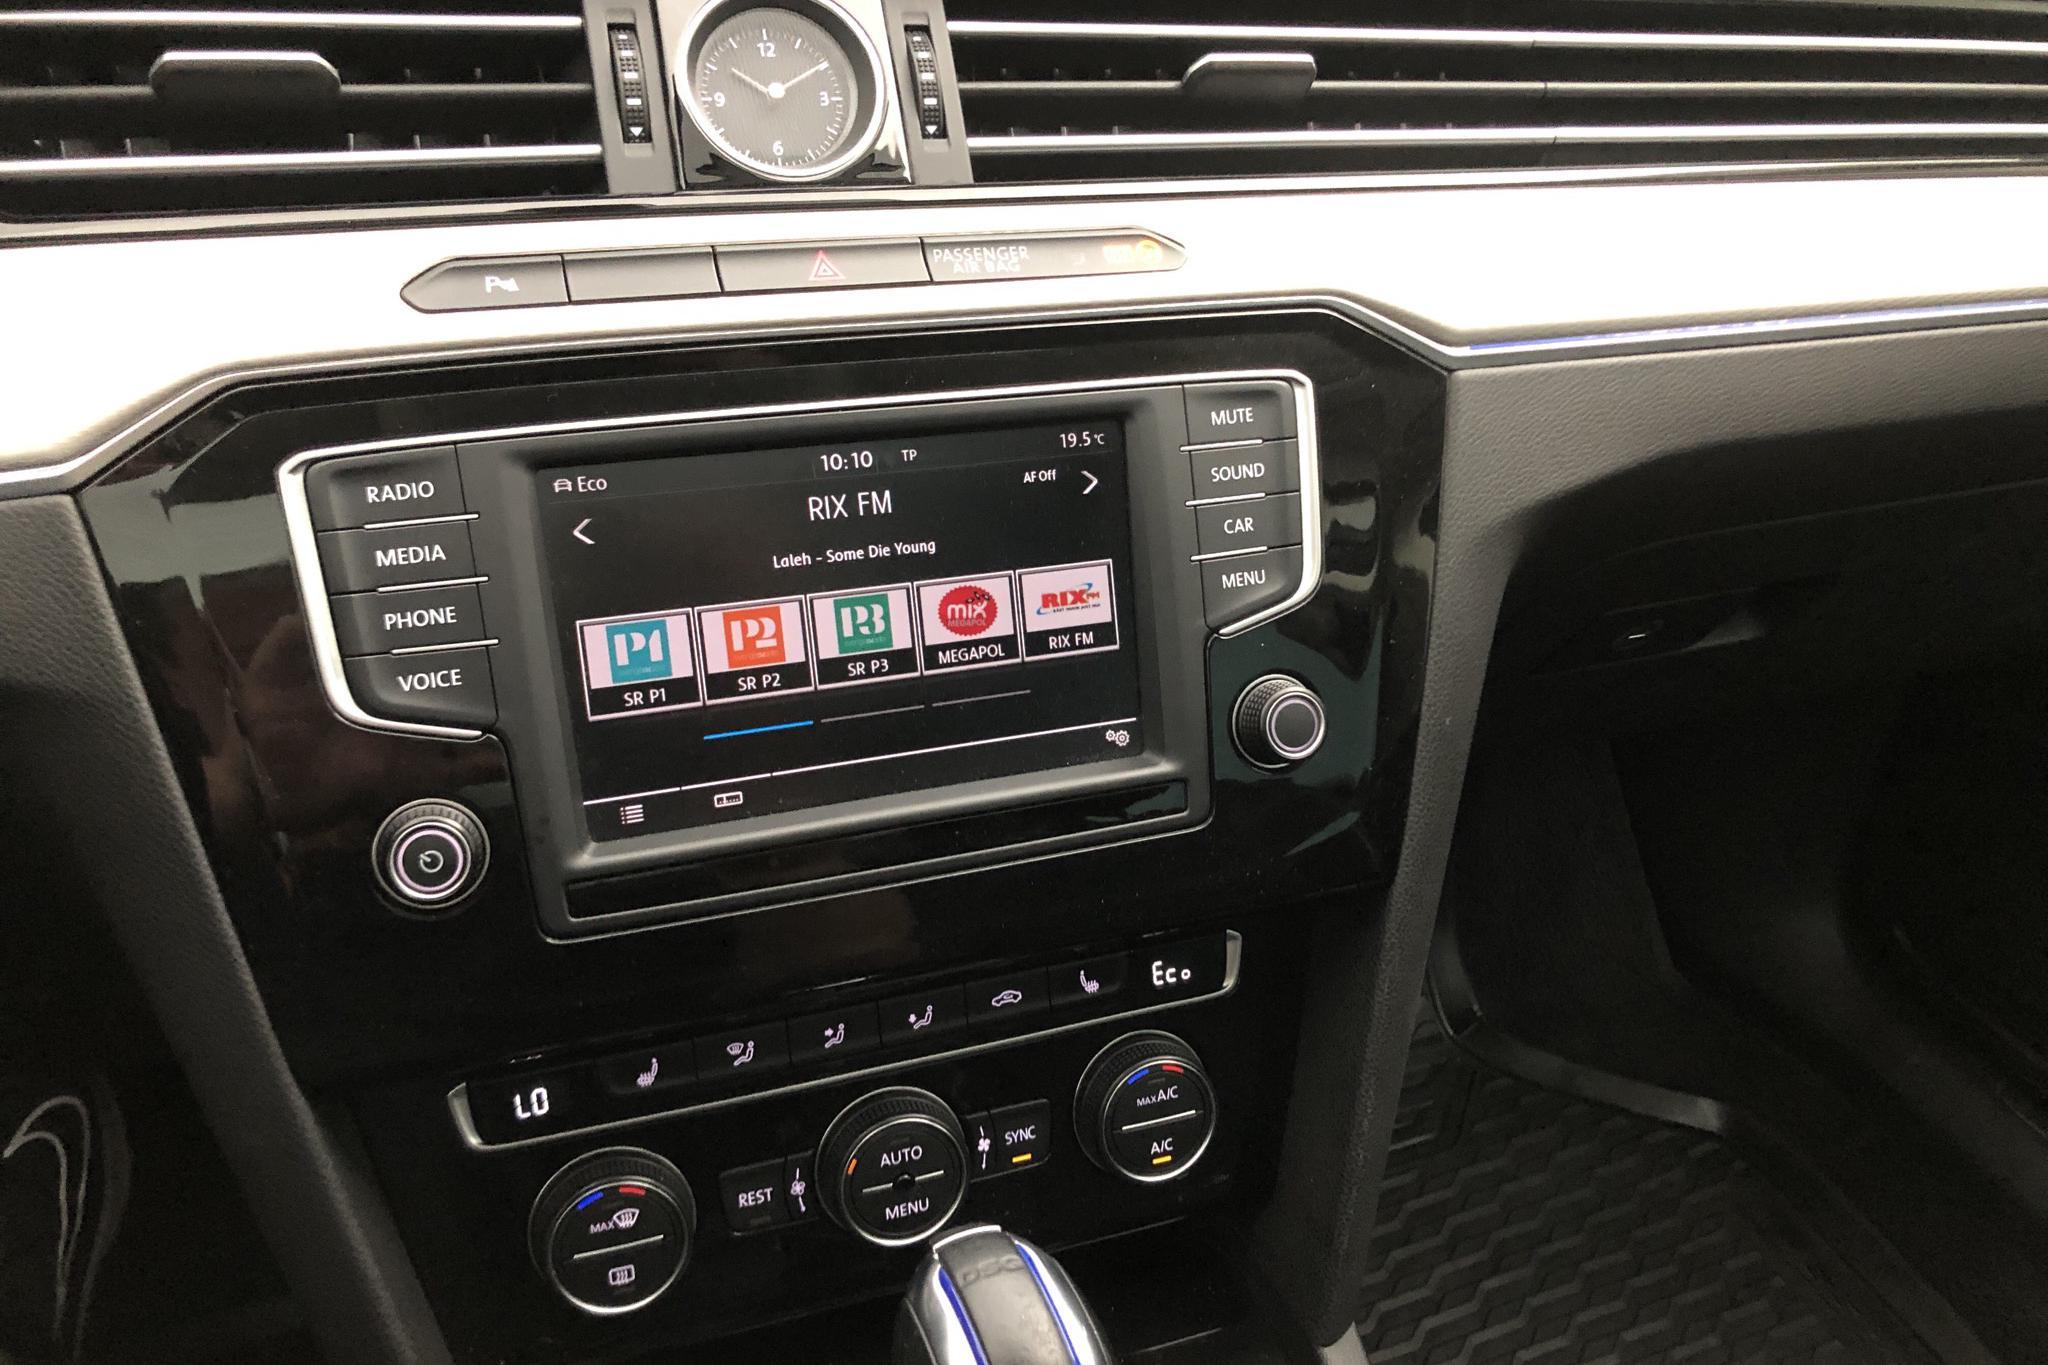 VW Passat 1.4 Plug-in-Hybrid Sportscombi (218hk) - 8 956 mil - Automat - Dark Grey - 2017